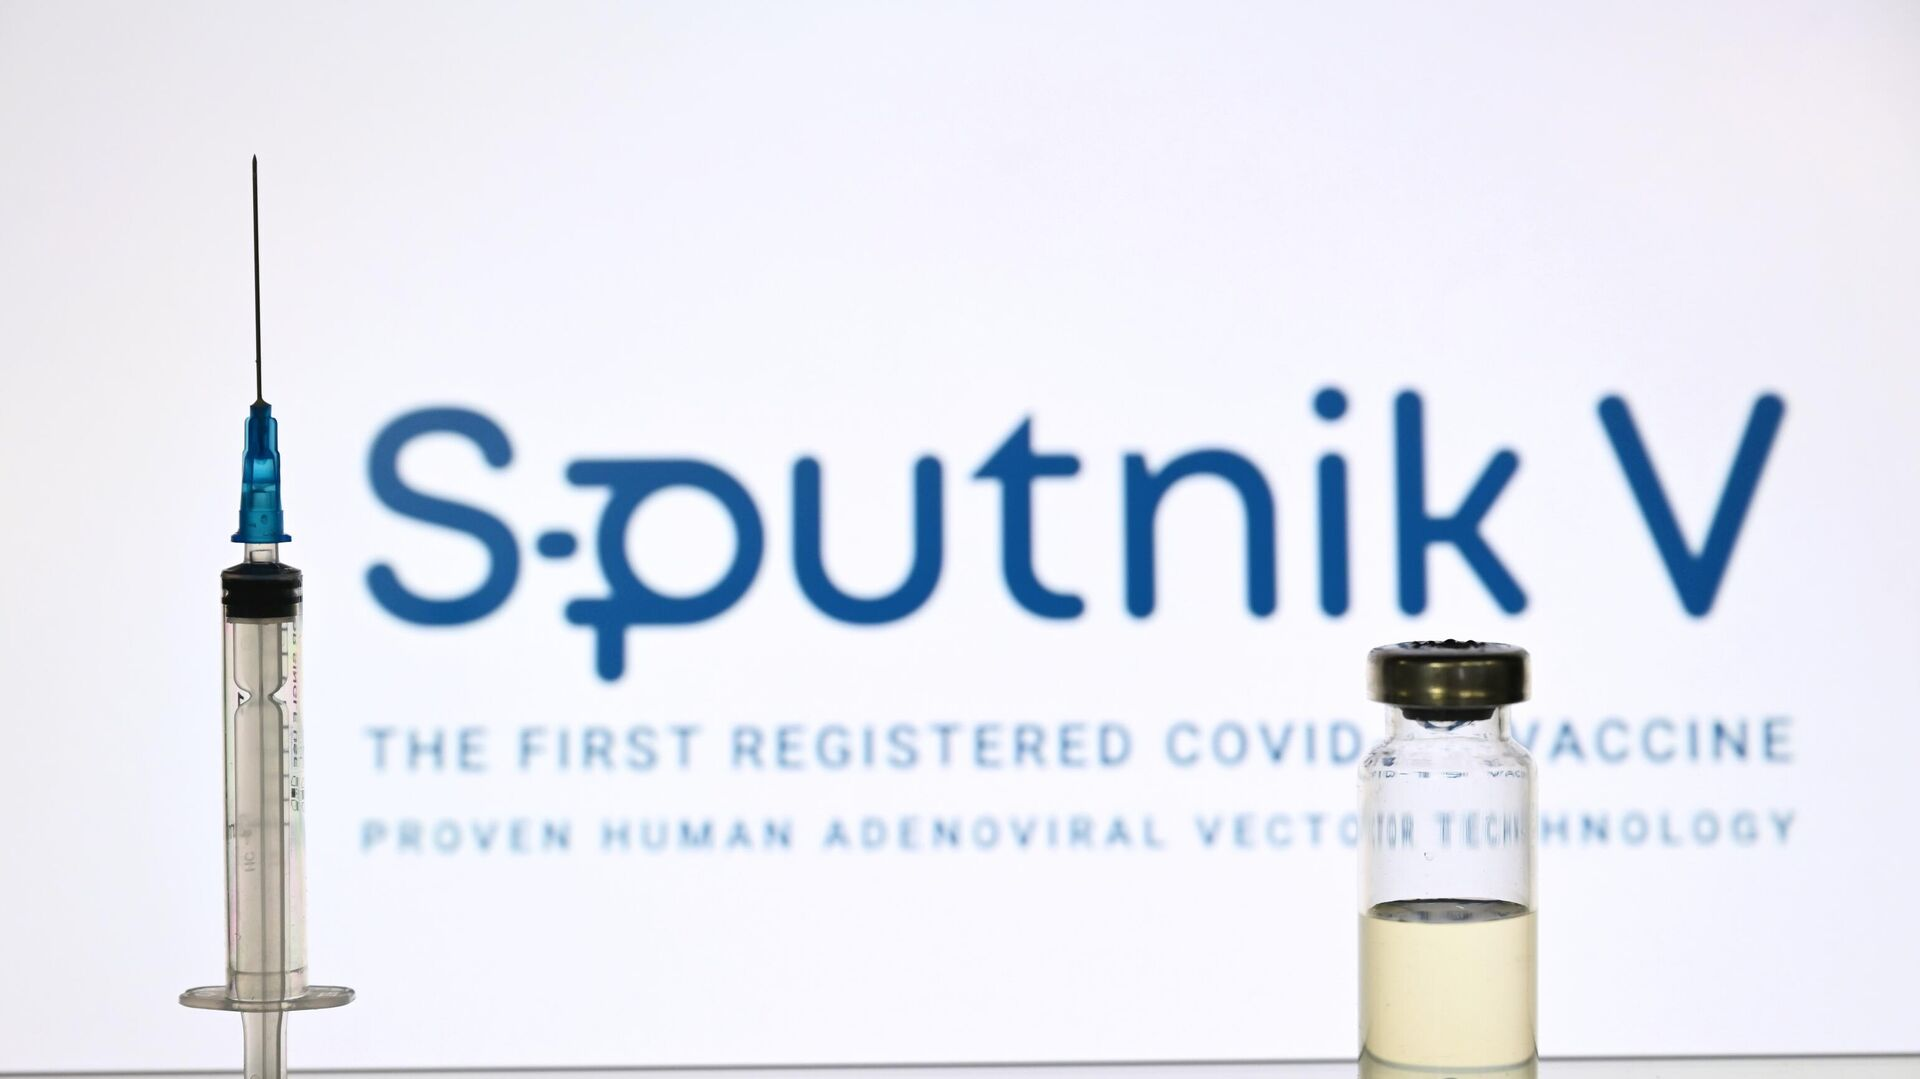 La vacuna contra el coronavirus Sputnik V - Sputnik Mundo, 1920, 15.03.2021